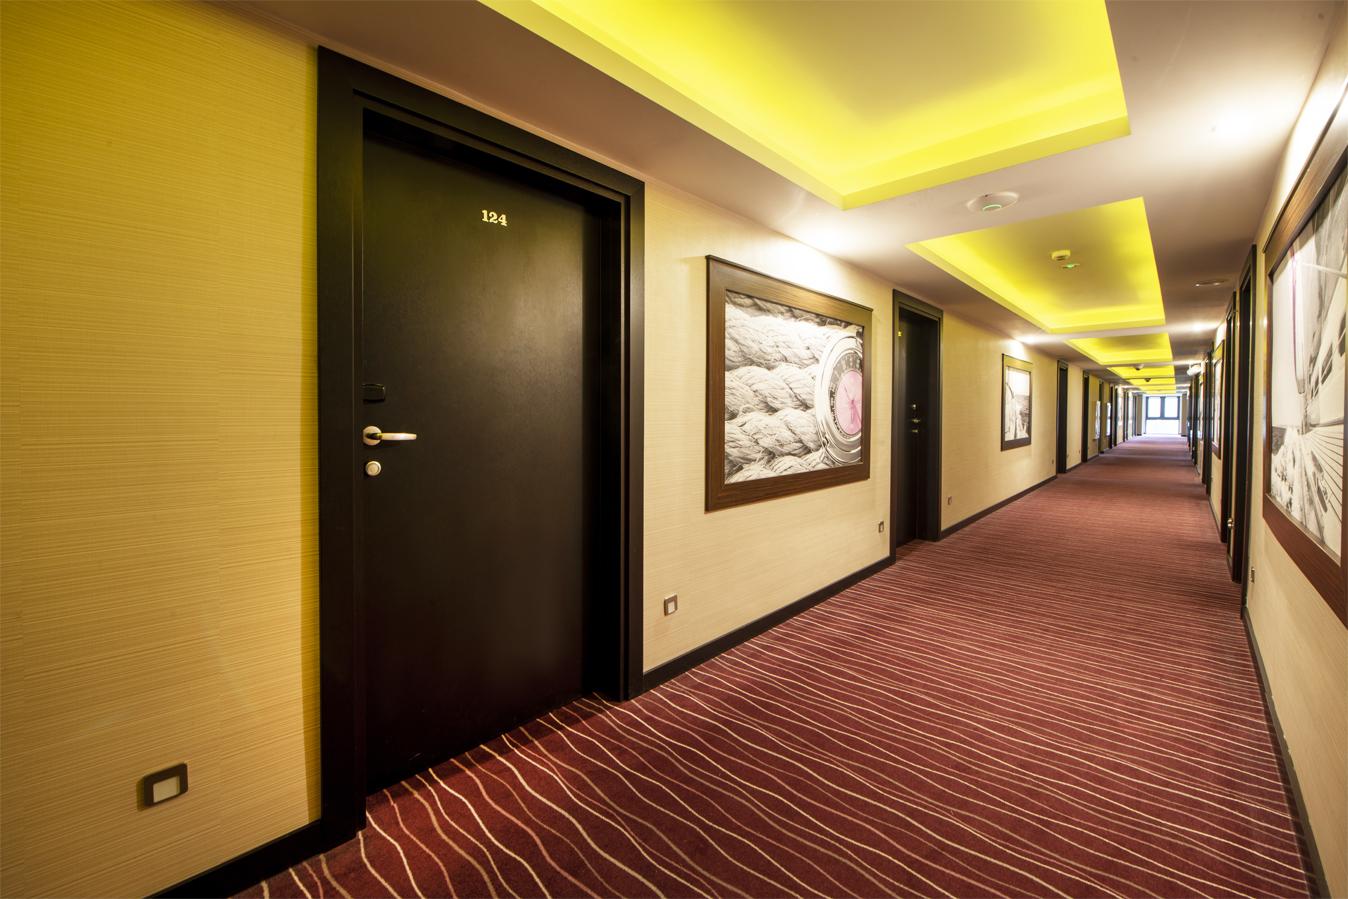 Hotel Primavera - drzwi INTER DOOR